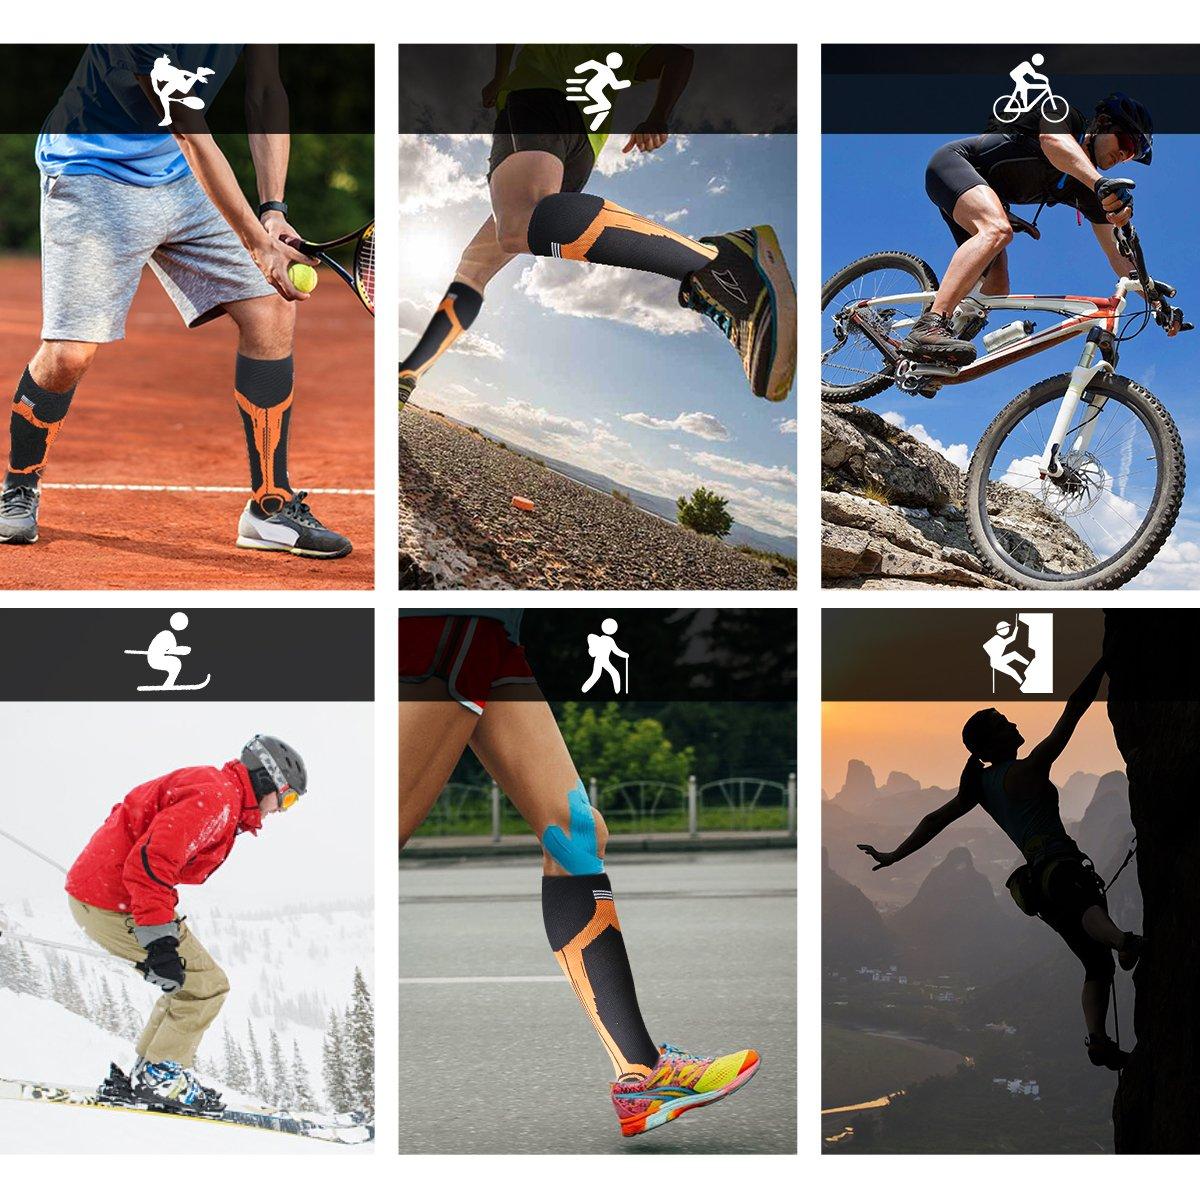 Nurses Shin Splints Flight Travel /& Maternity Pregnancy L//XL UK Women 5.5-13 // UK Men 7-13.5 Compression Socks for Men /& Women Best Graduated Athletic Fit for Running